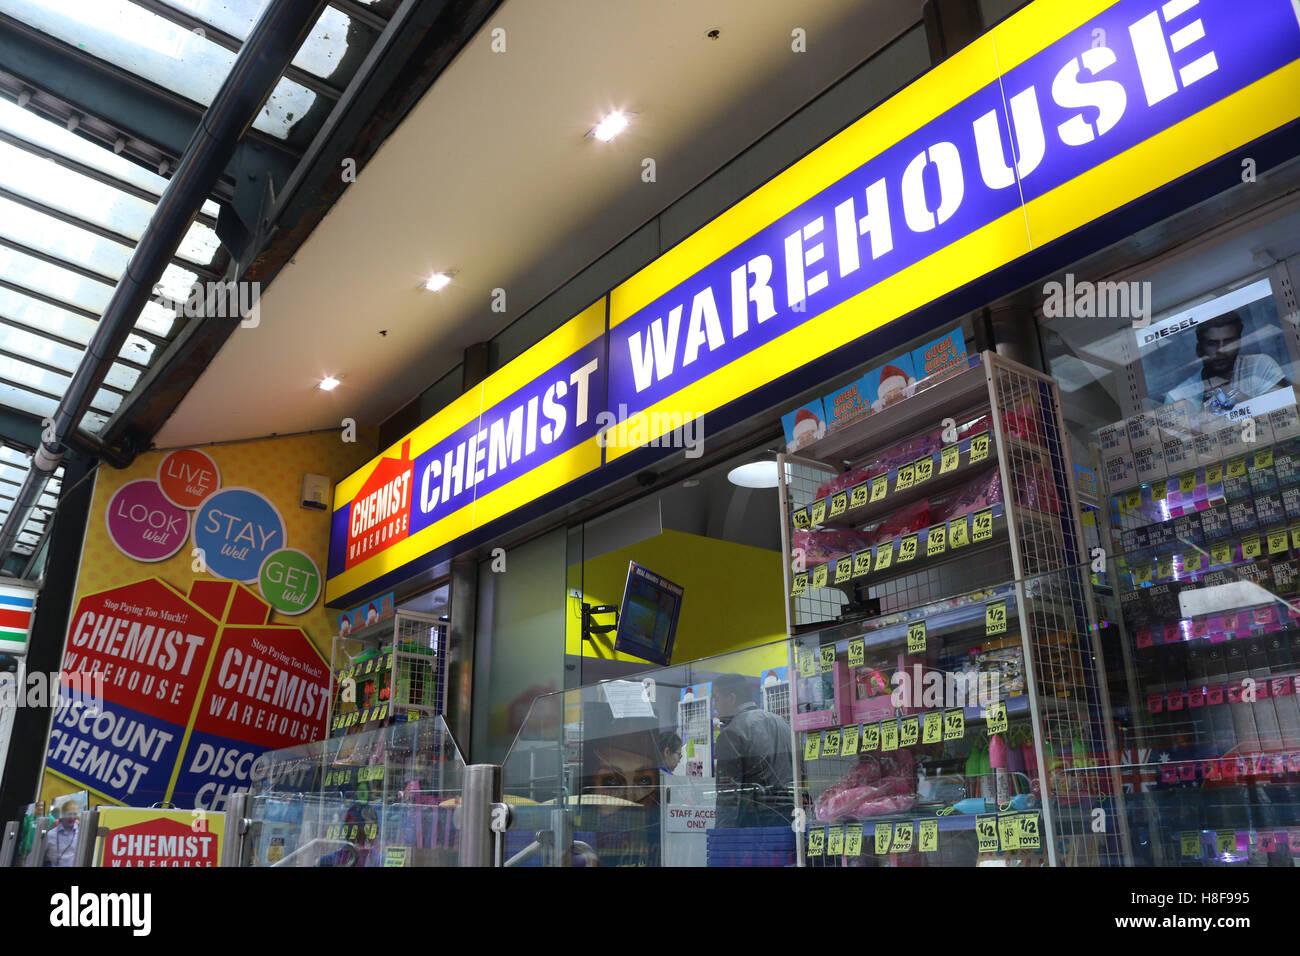 Chemist Warehouse Discount George Street Sydney Stock Australia